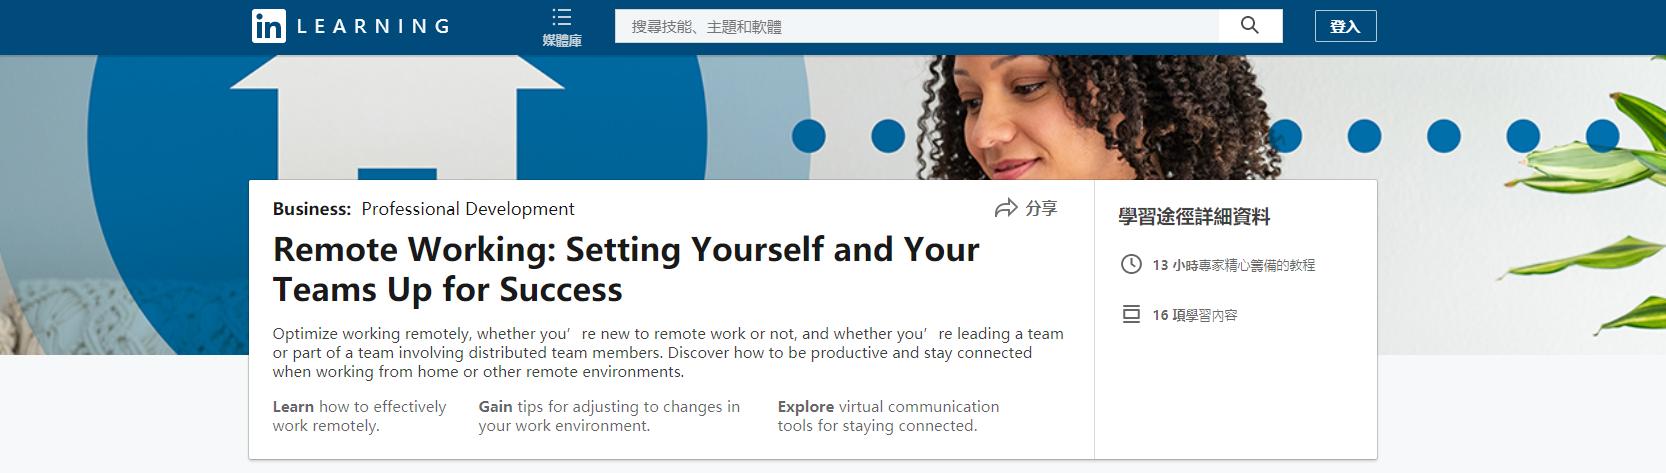 Linkedin 提供完整的遠端工作教學